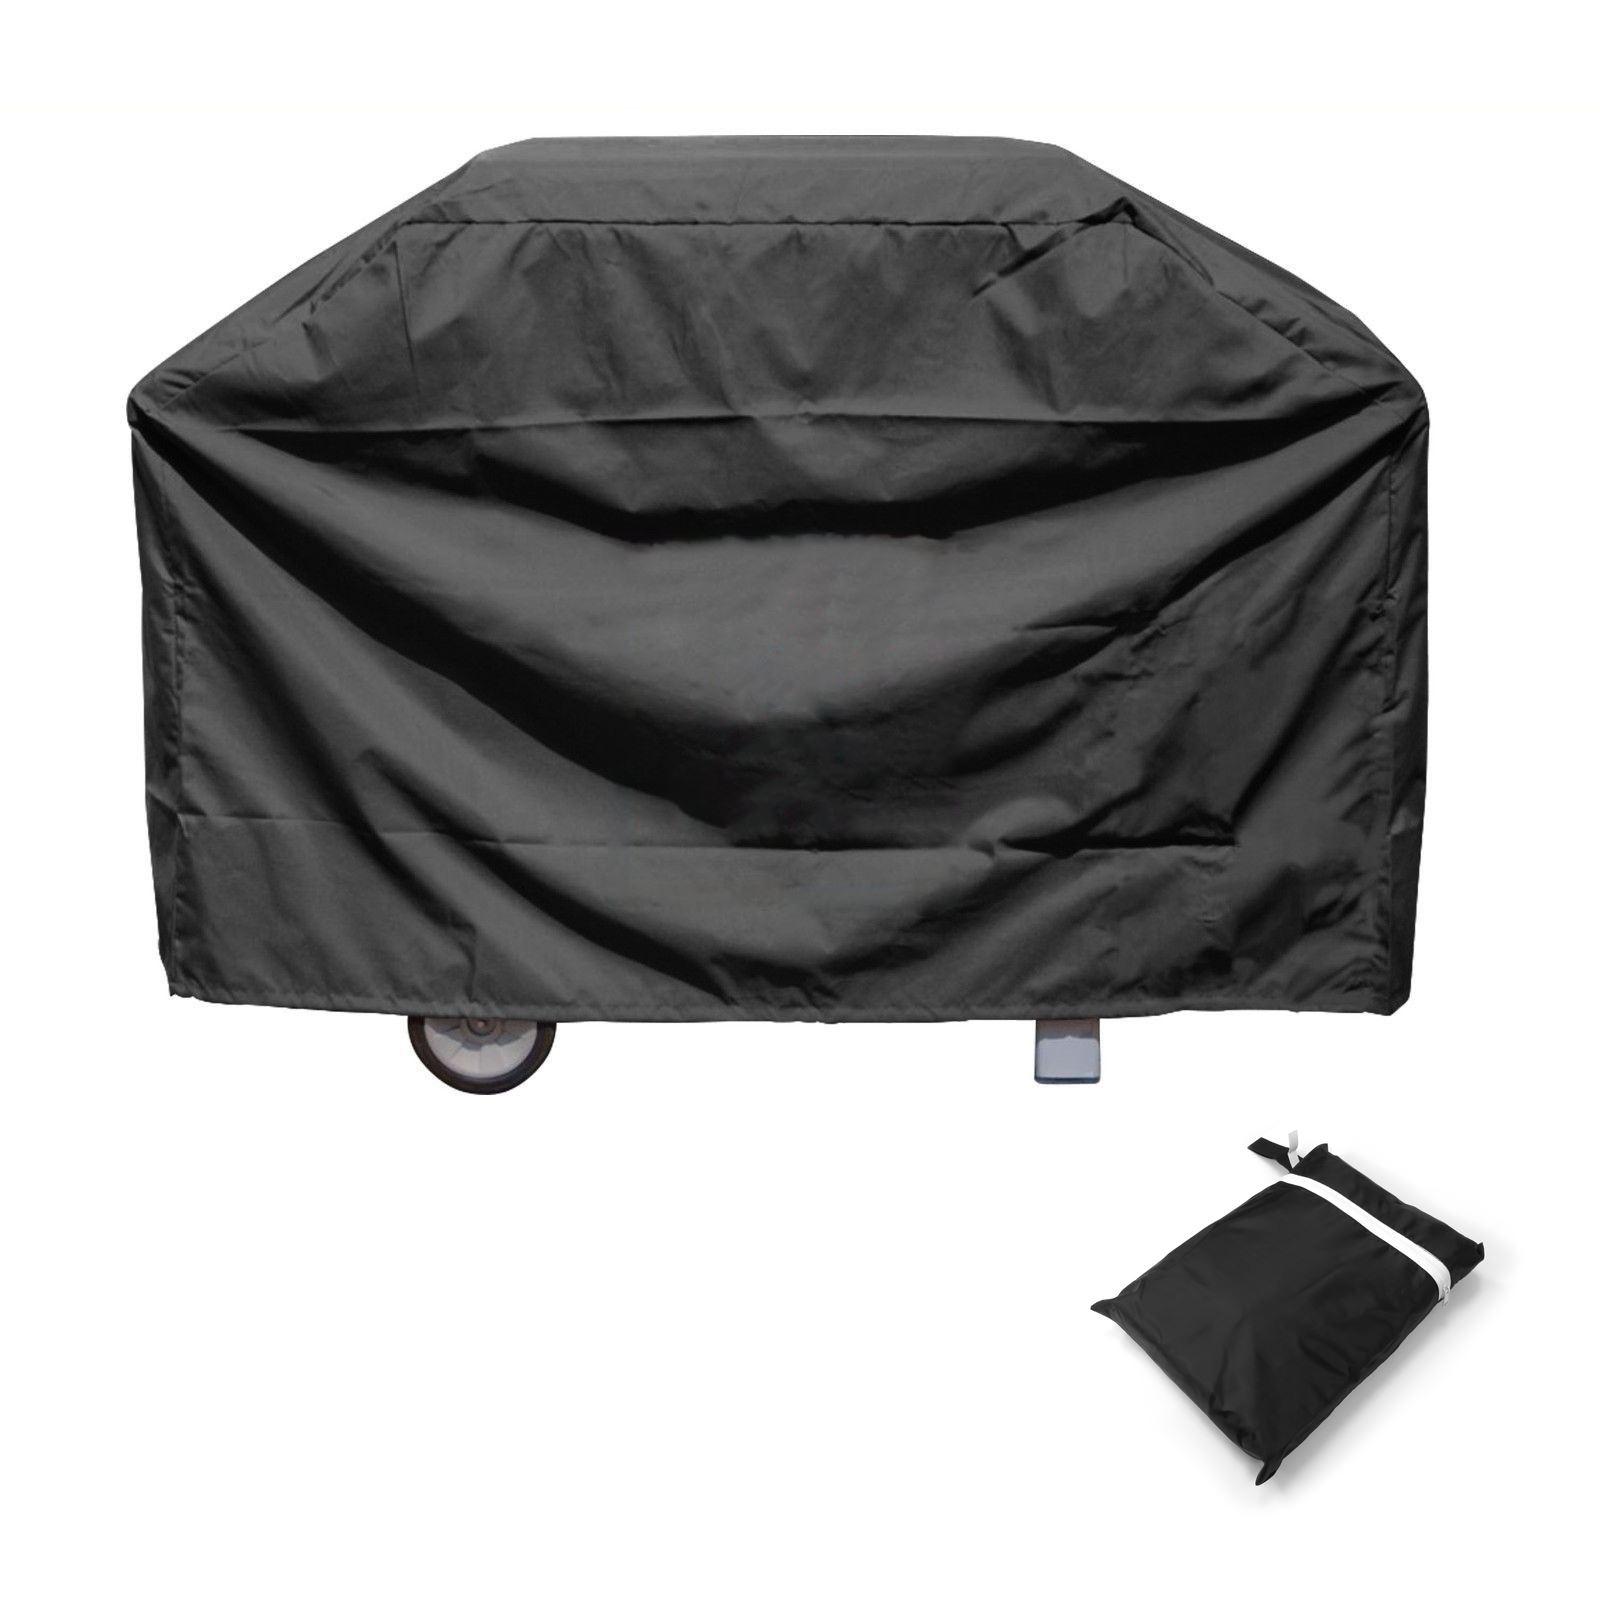 145cm BBQ Cover Heavy Duty Waterproof Garden Patio Rain Dust Protection